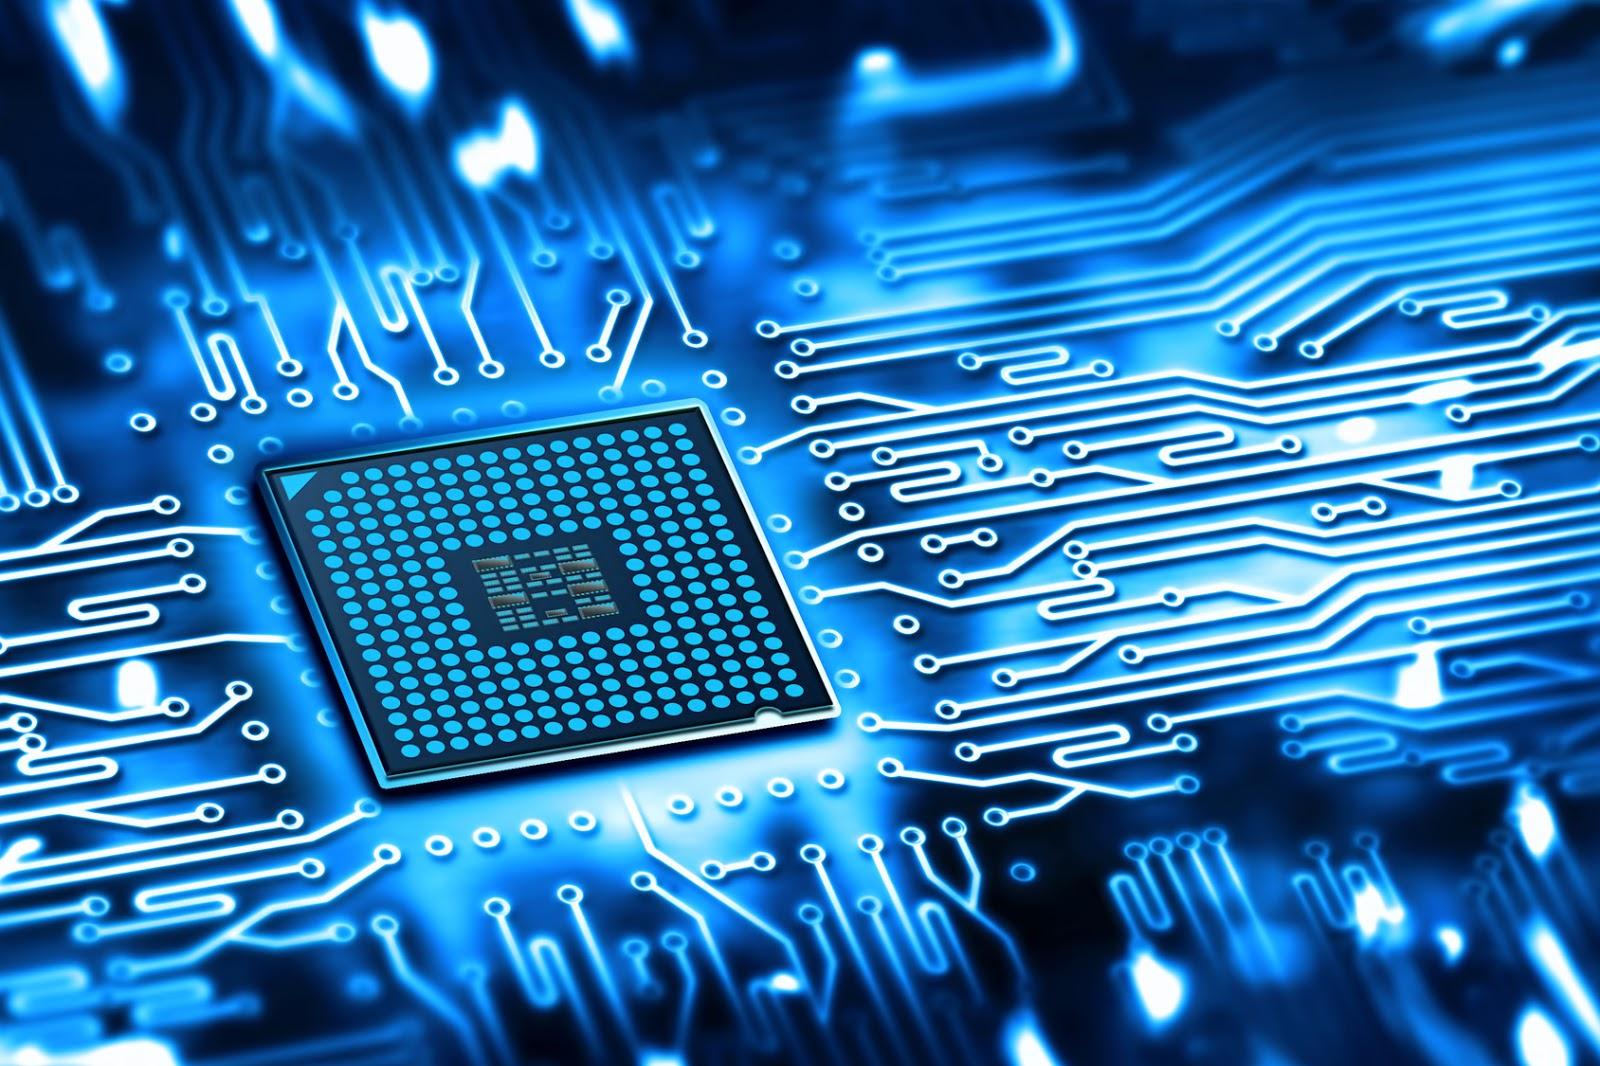 Россиян предупредили о резком росте цен на электронику